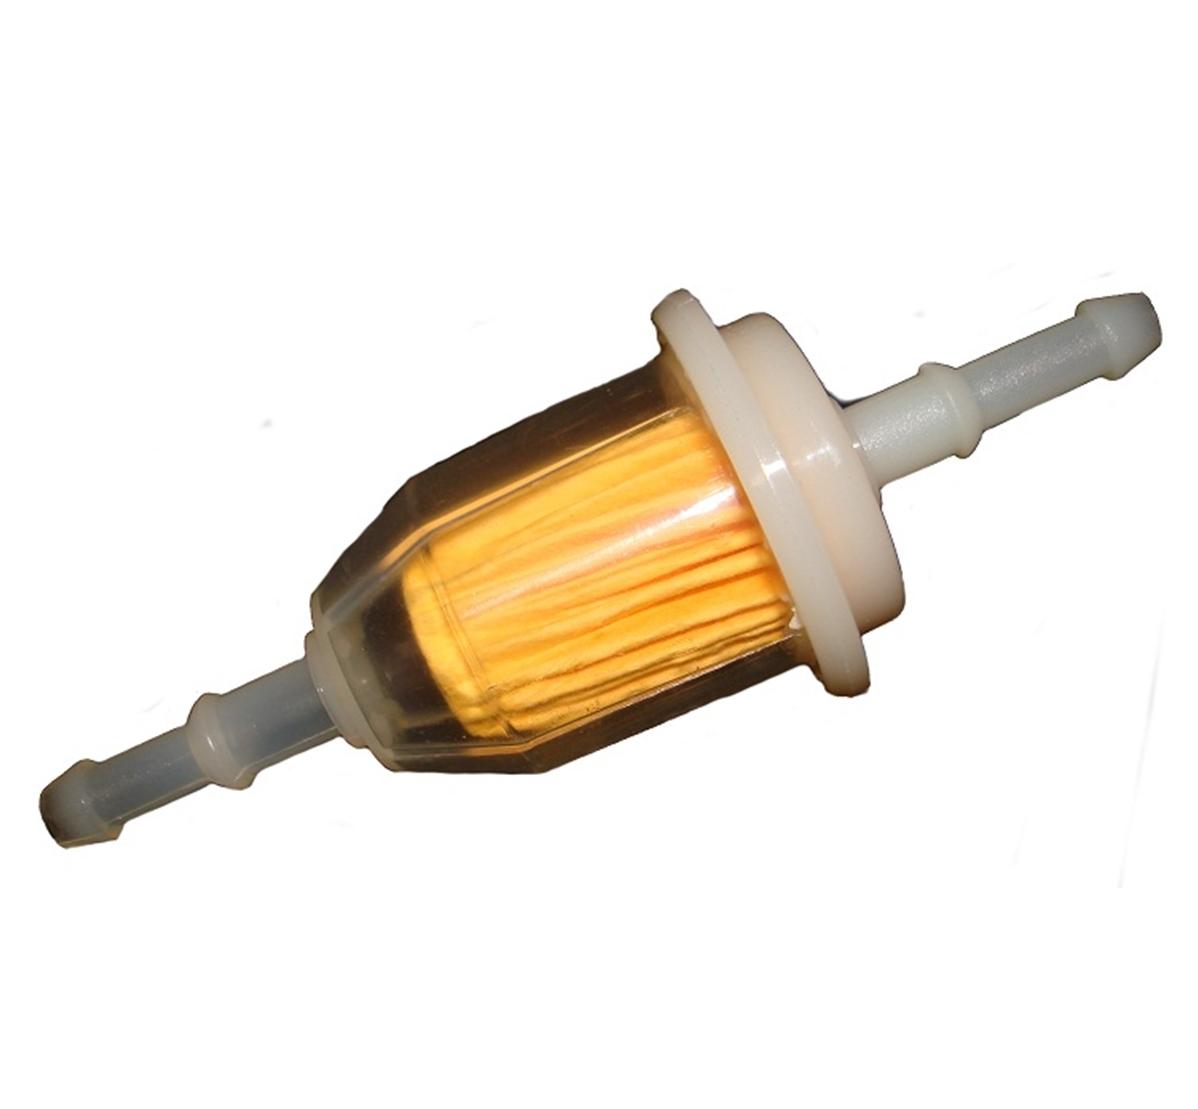 John Deere La115 Fuel Filter System Wiring Diagram La135 Scheme For La100 La105 La110 La120